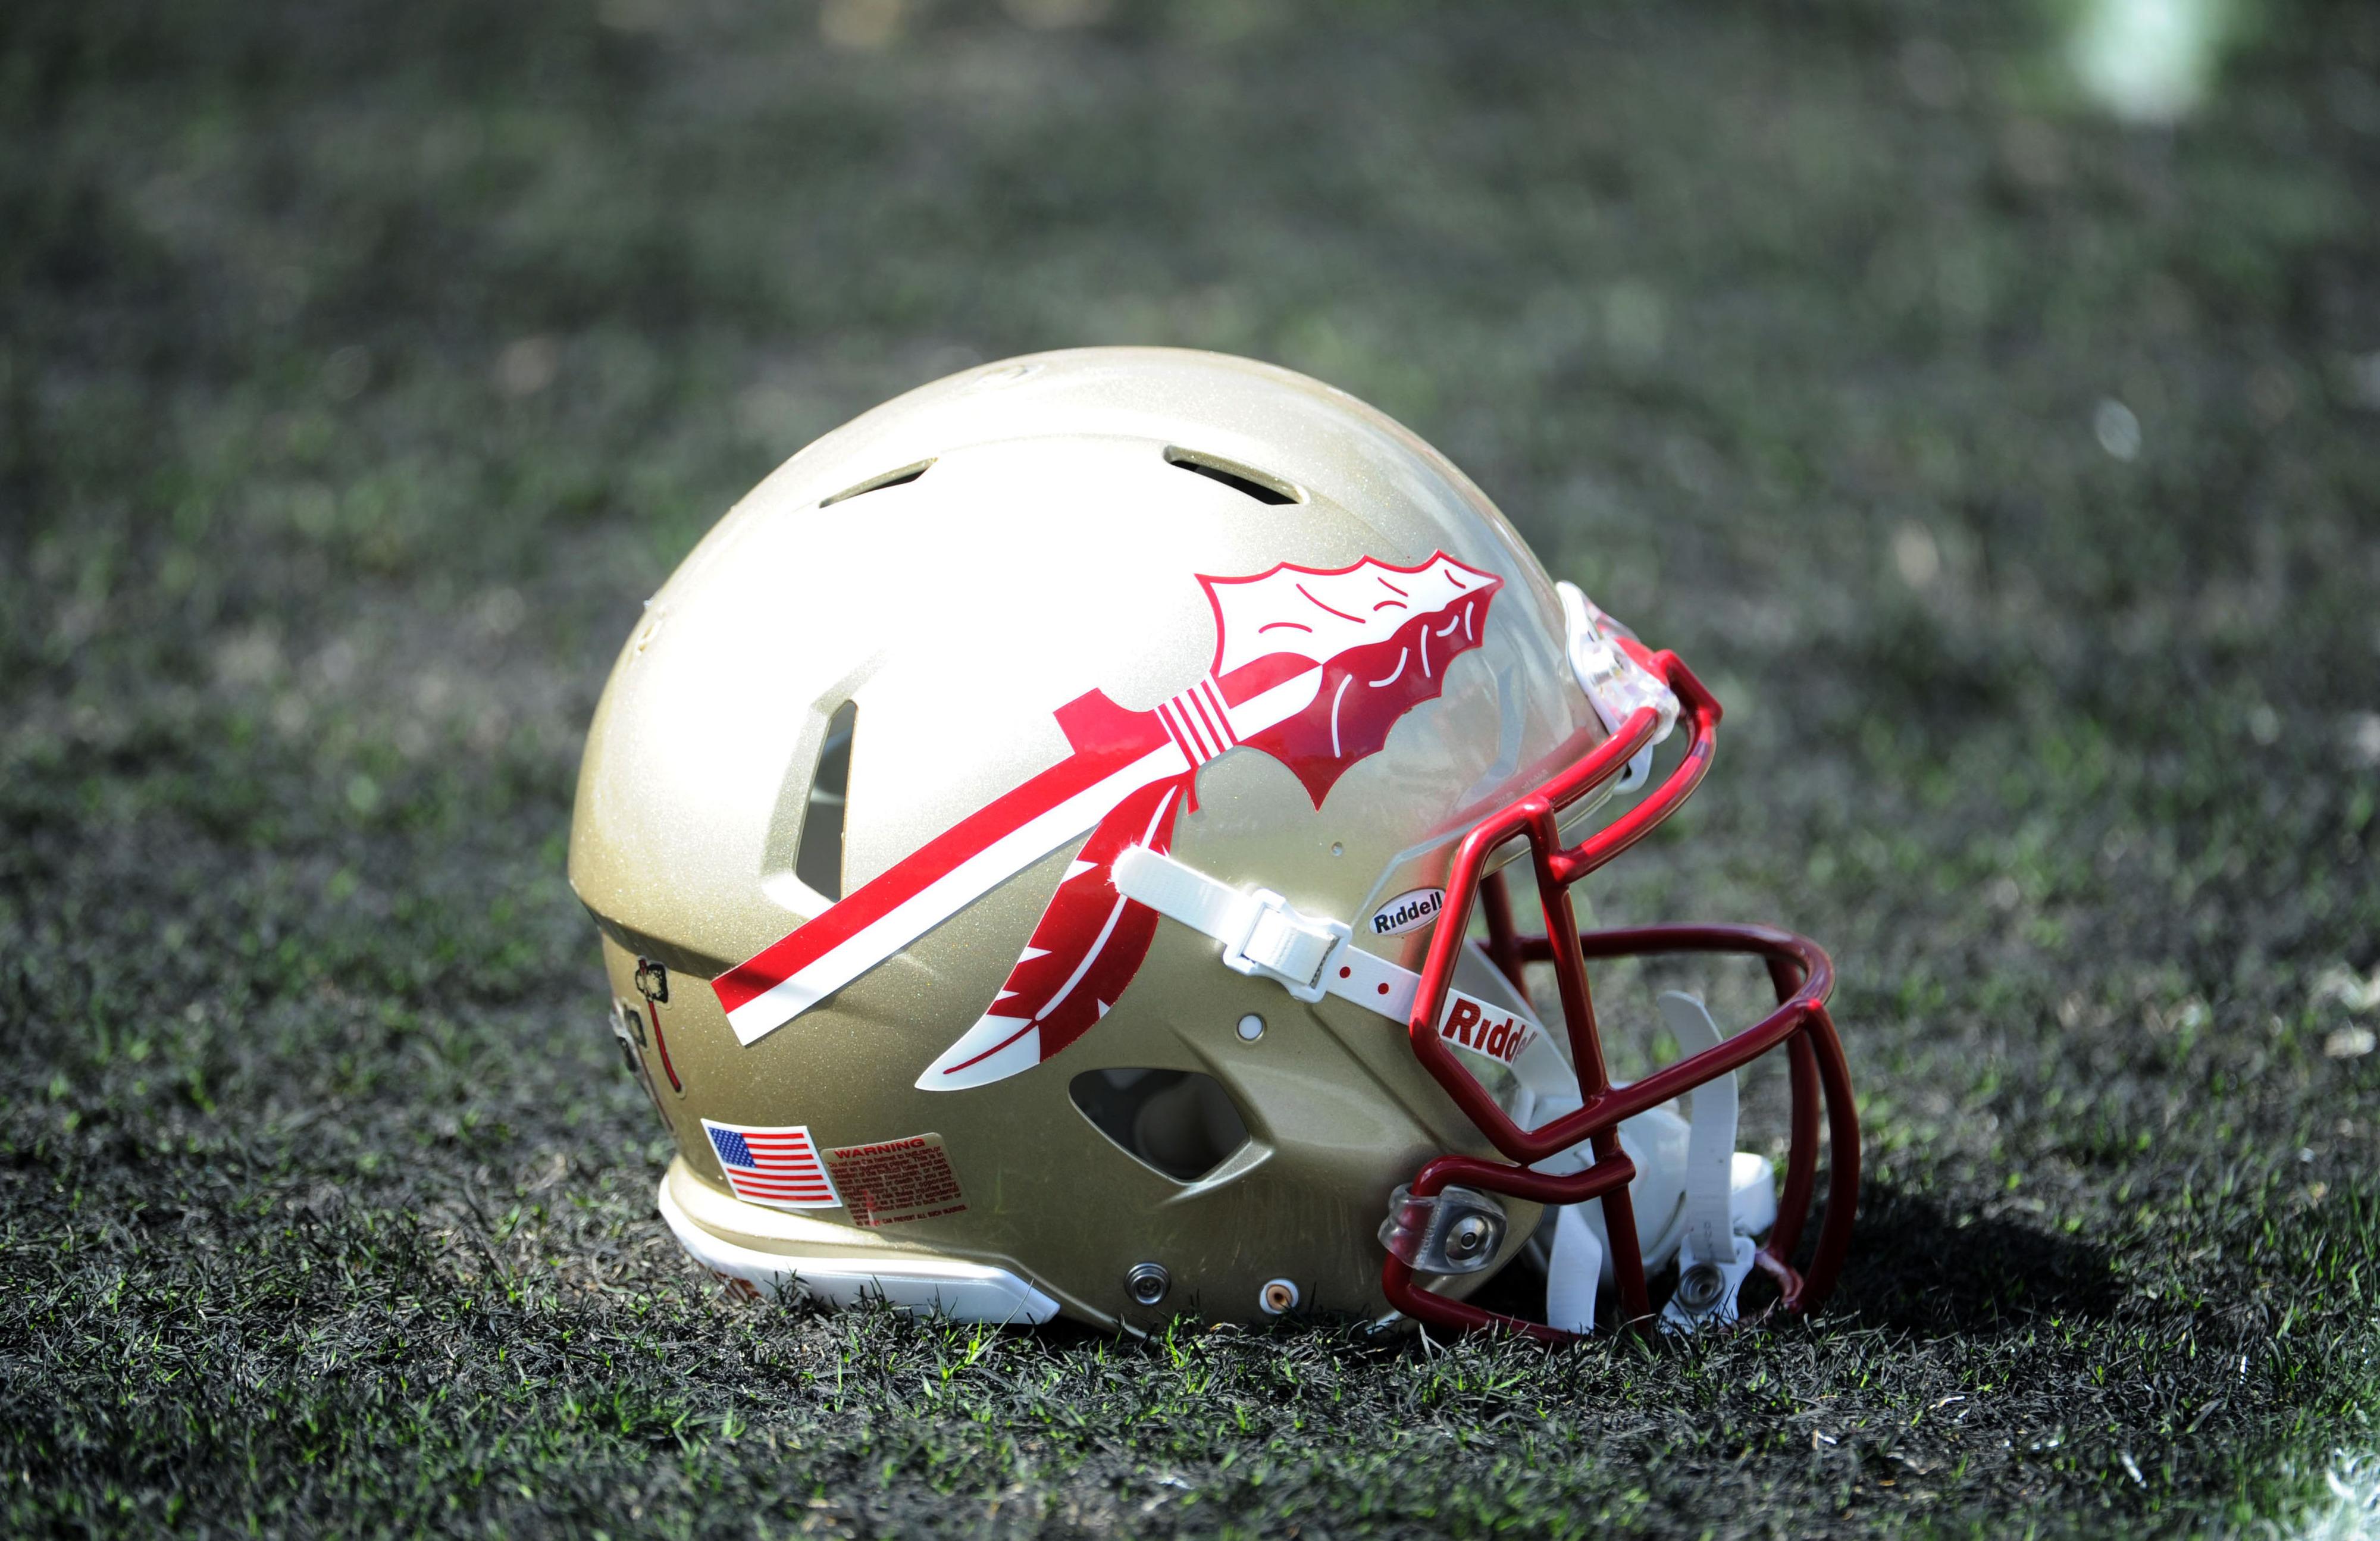 Sept 15, 2012;  Tallahassee, Florida, USA; Florida State Seminoles helmet before the game against the Wake Forest Demon Deacons at Doak Campbell Stadium. Mandatory Credit: Melina Vastola-US PRESSWIRE